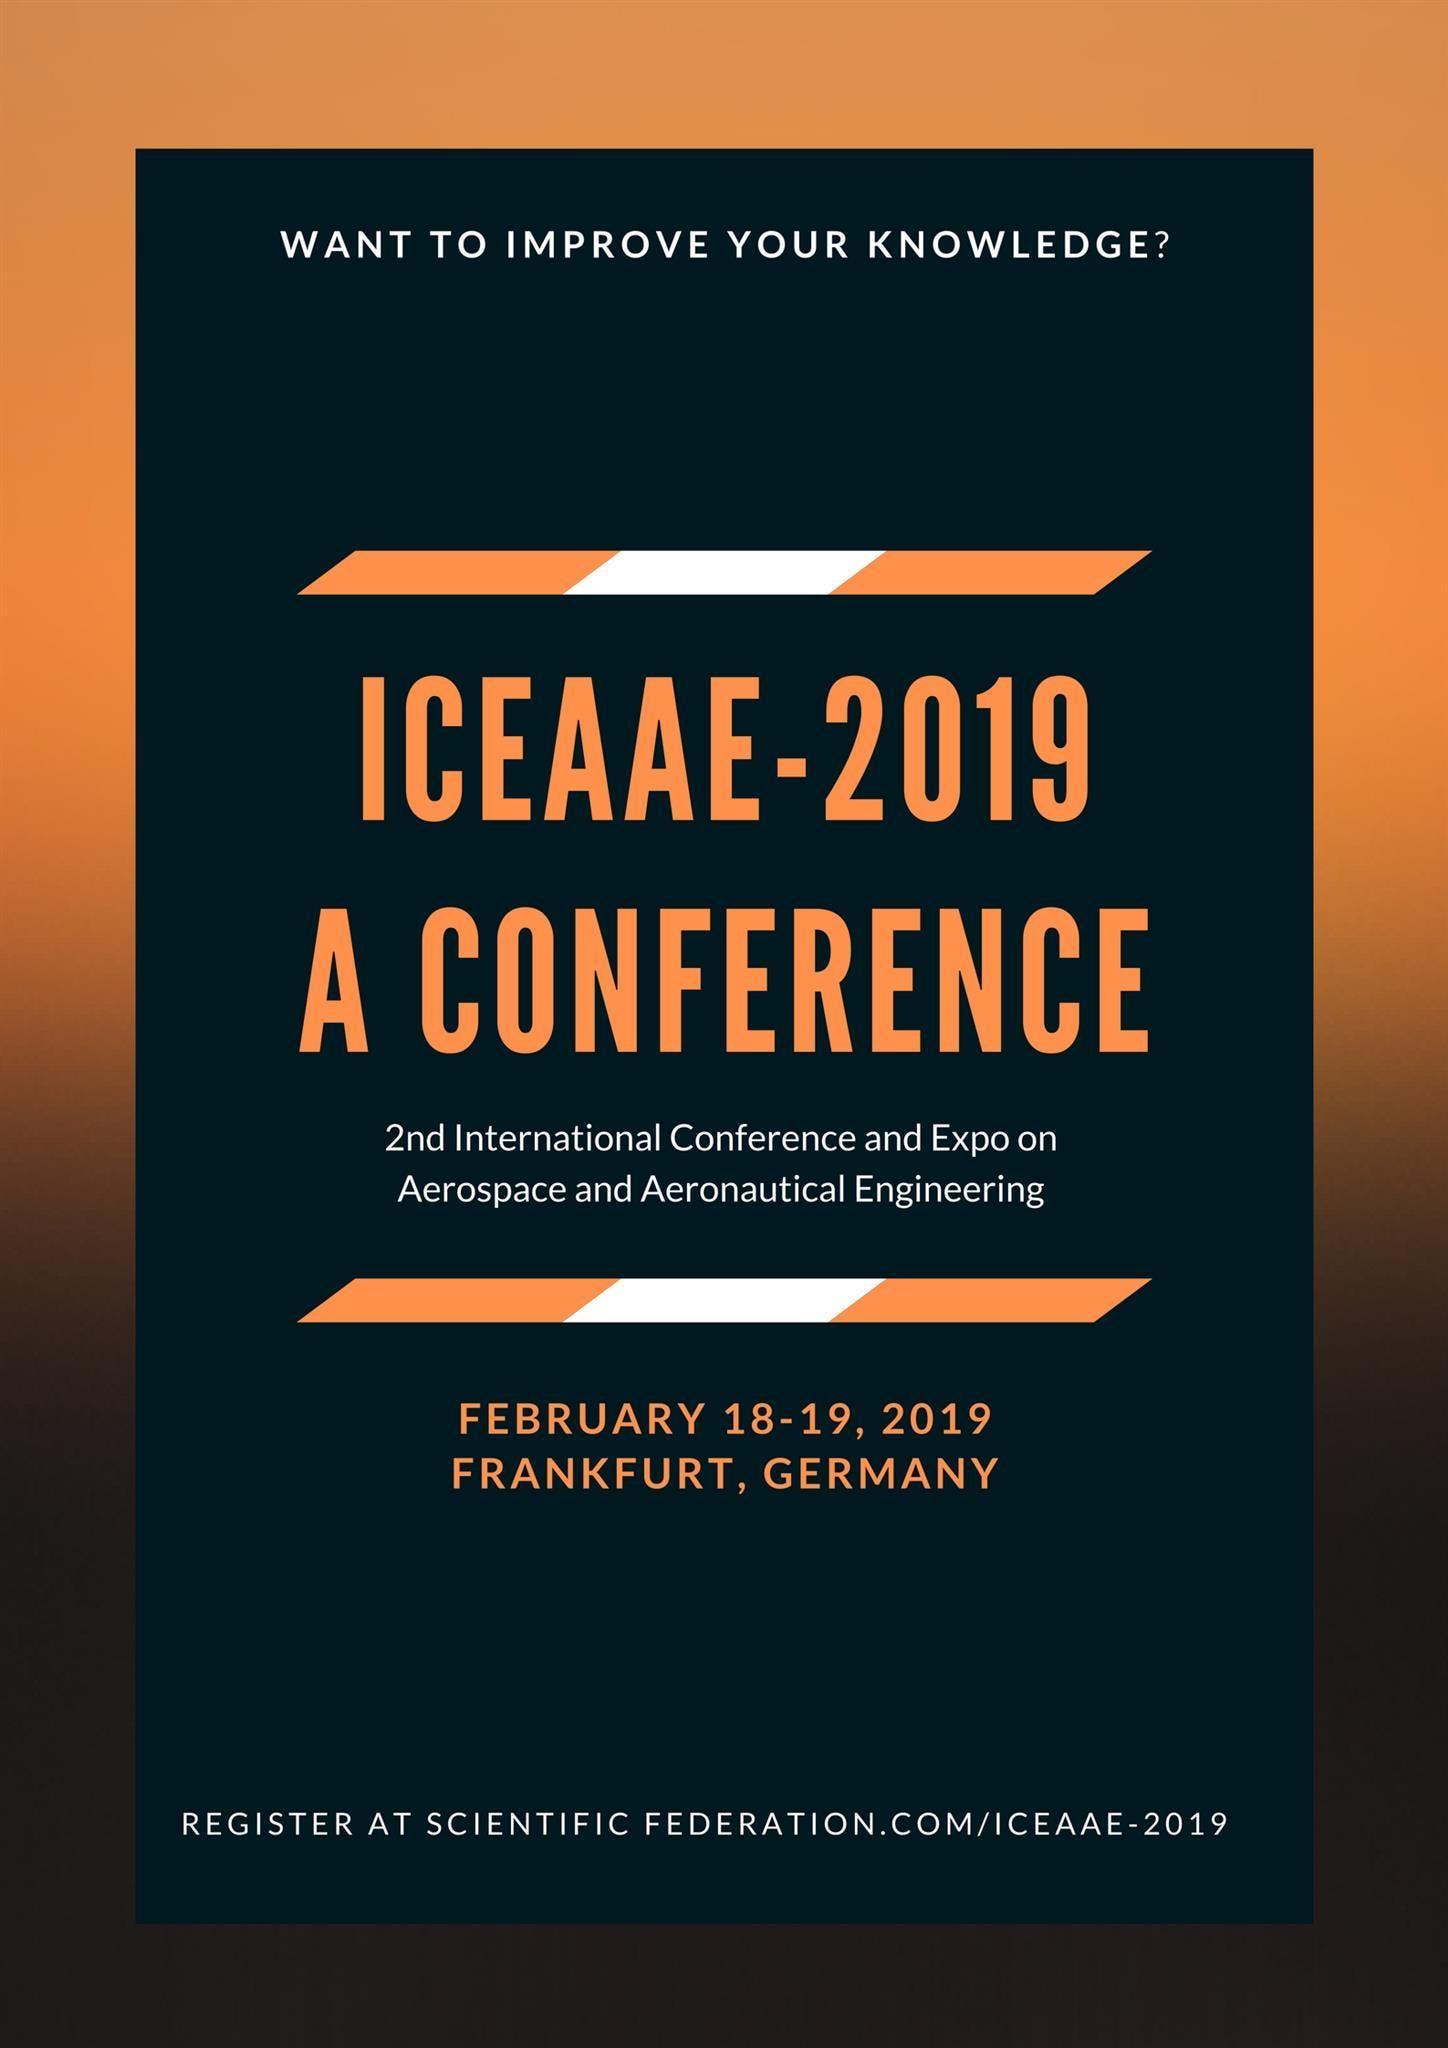 2nd International Conference & Expo on Aerosp